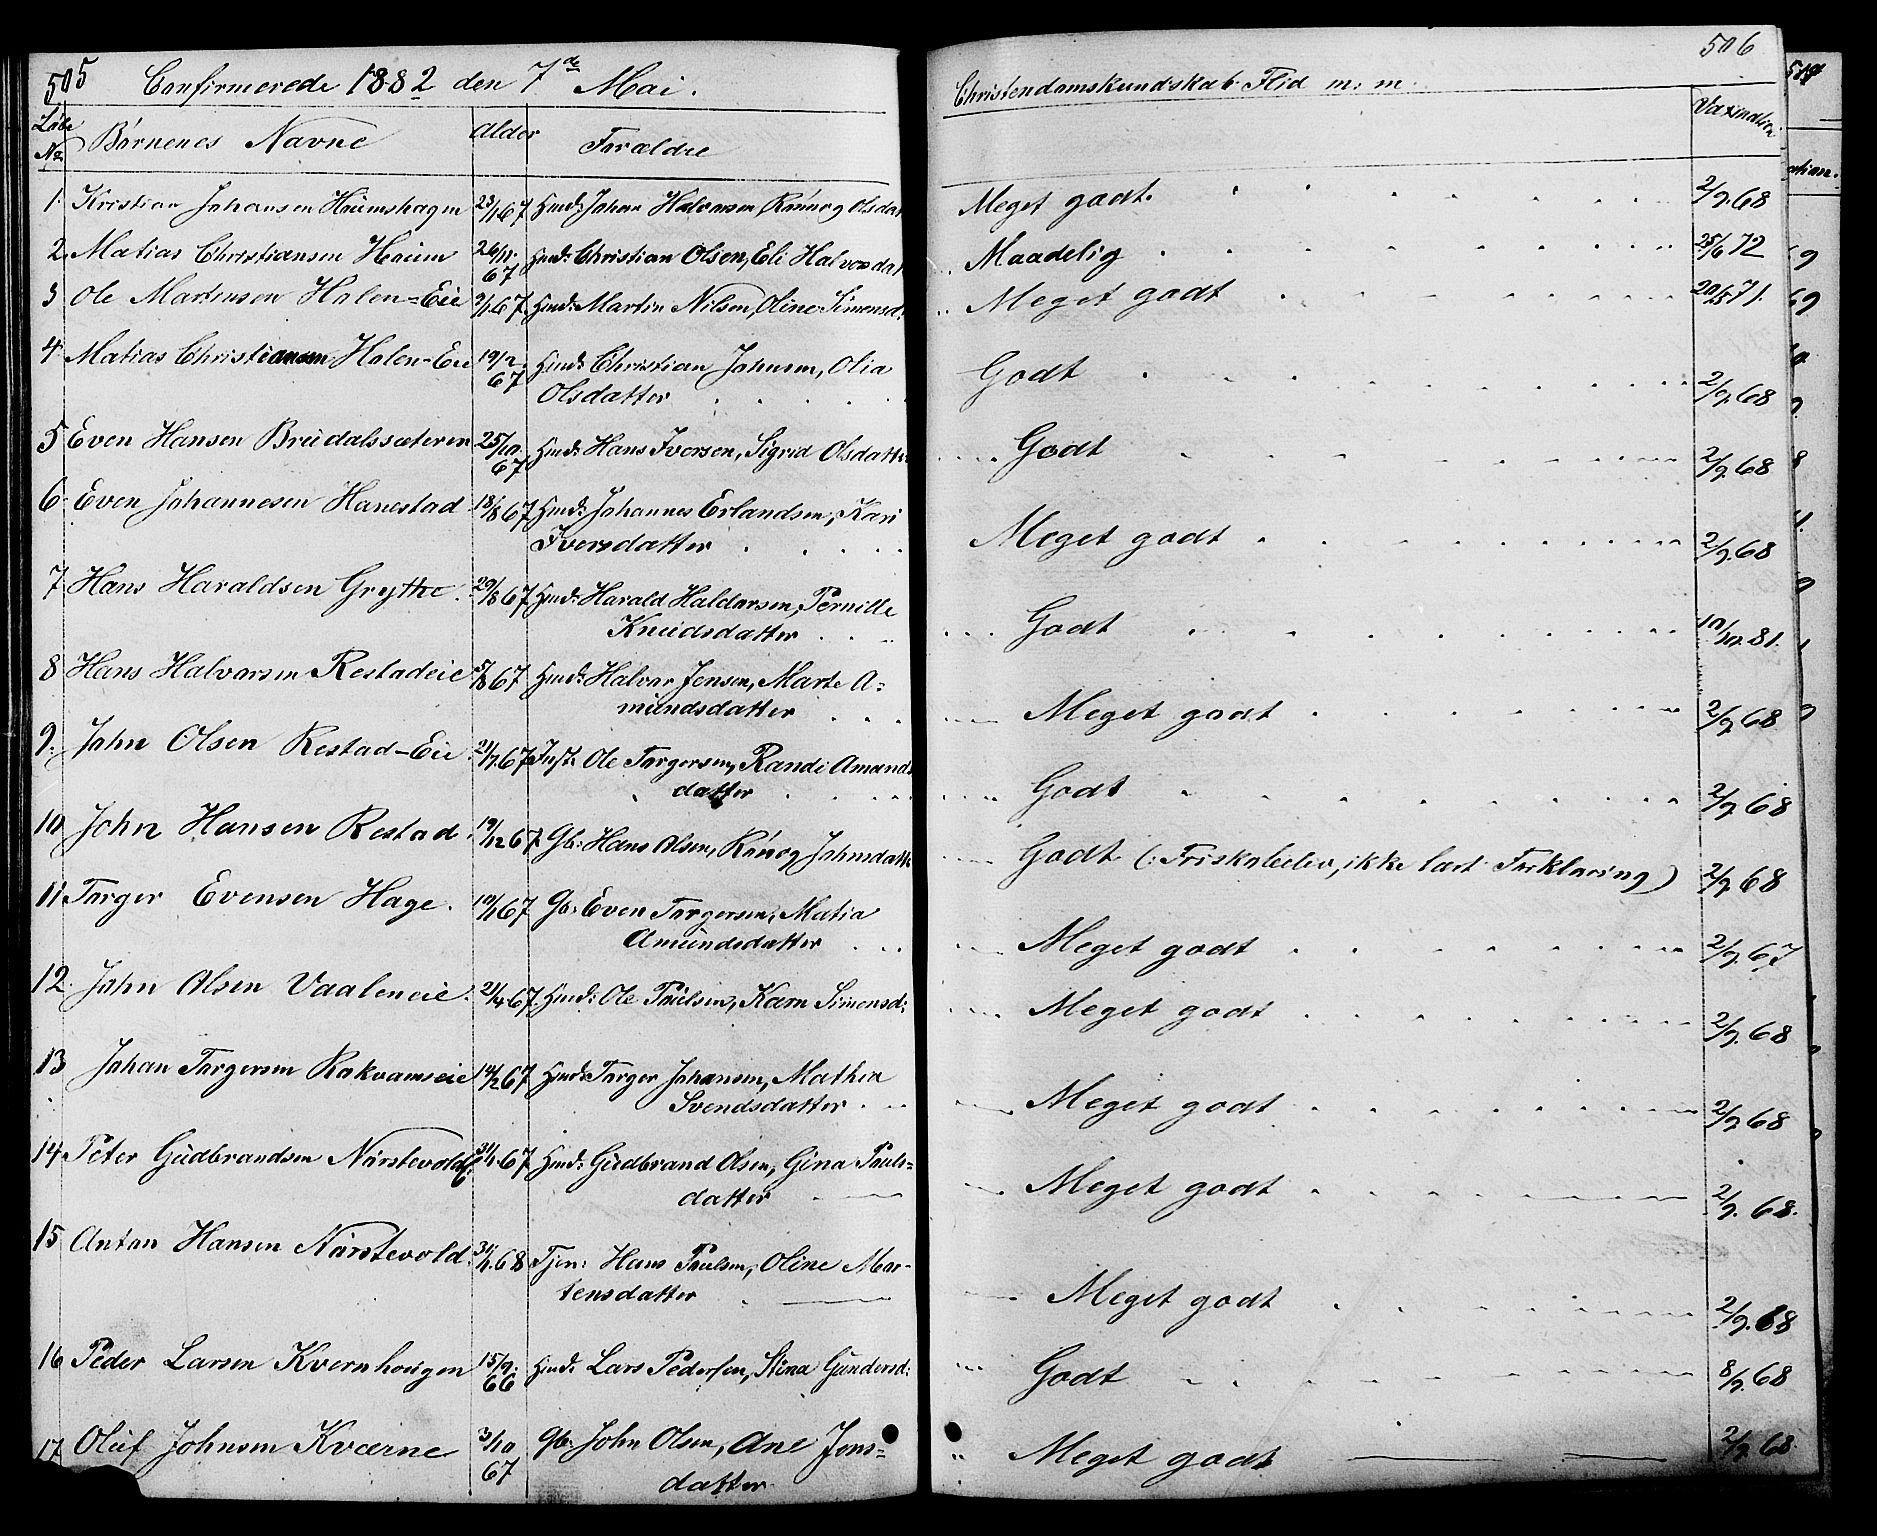 SAH, Østre Gausdal prestekontor, Klokkerbok nr. 1, 1863-1893, s. 505-506